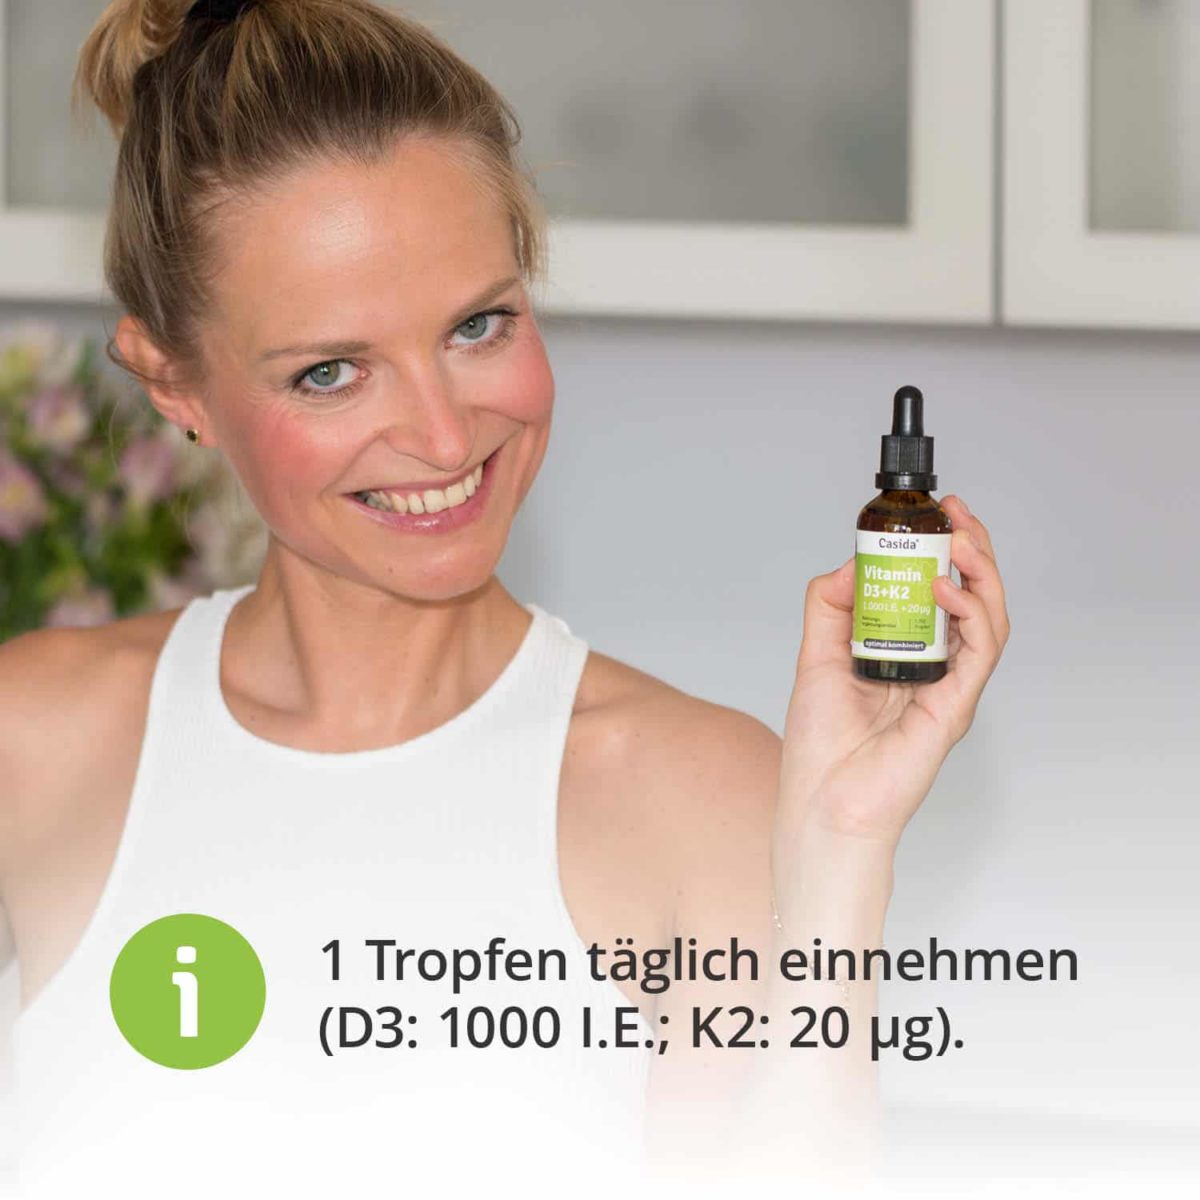 Casida Vitamin D3 1000 I.E. + K2 20 μg Tropfen – 50 ml 16672026 PZN Apotheke hochdosiert Immunsystem Magnesium Calcium6